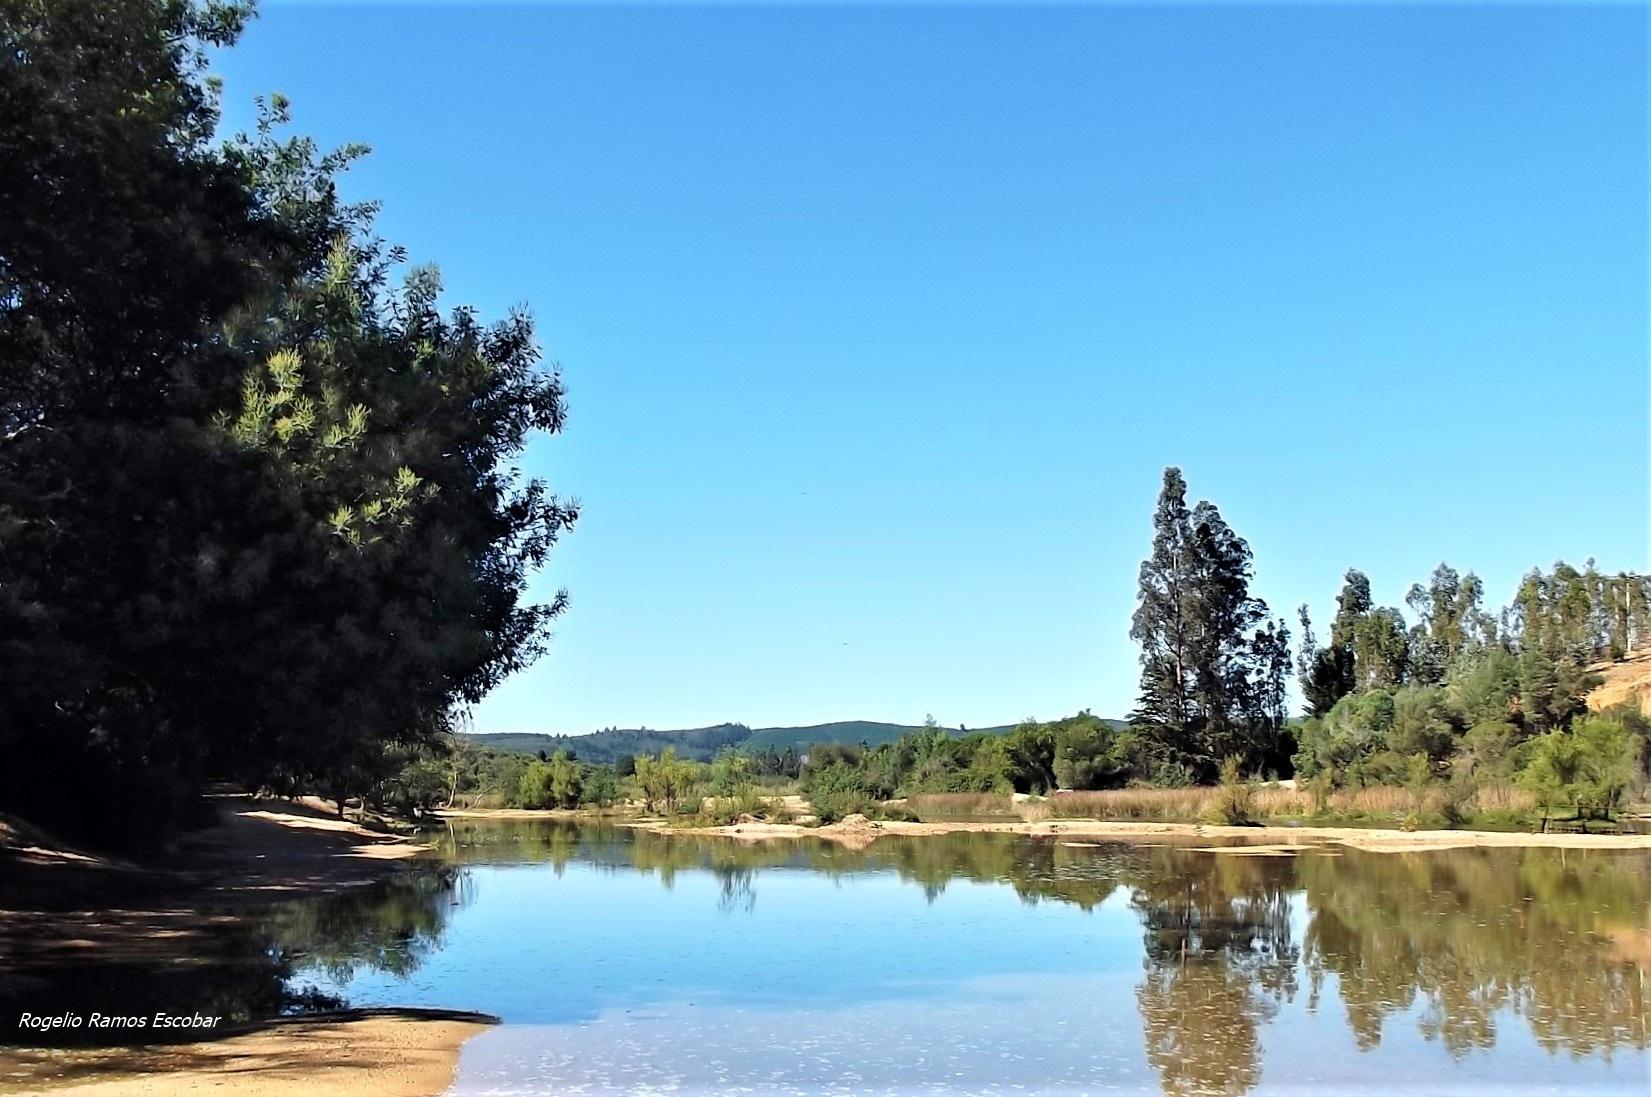 Laguna by Rogelio Ramos Escobar